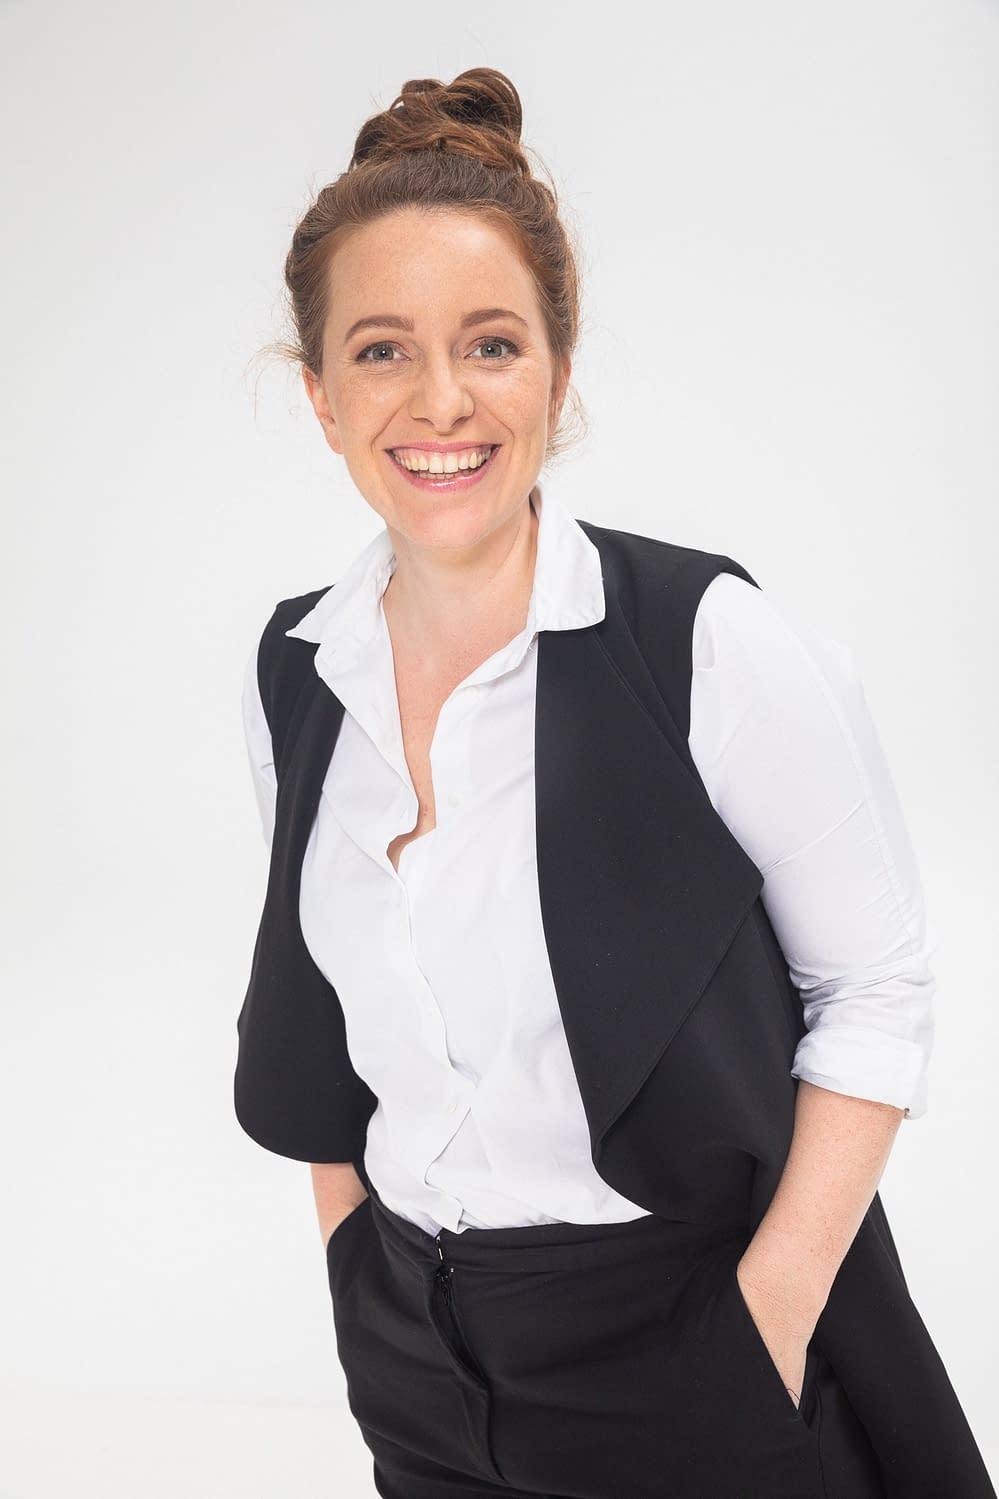 Business Portrait Eva